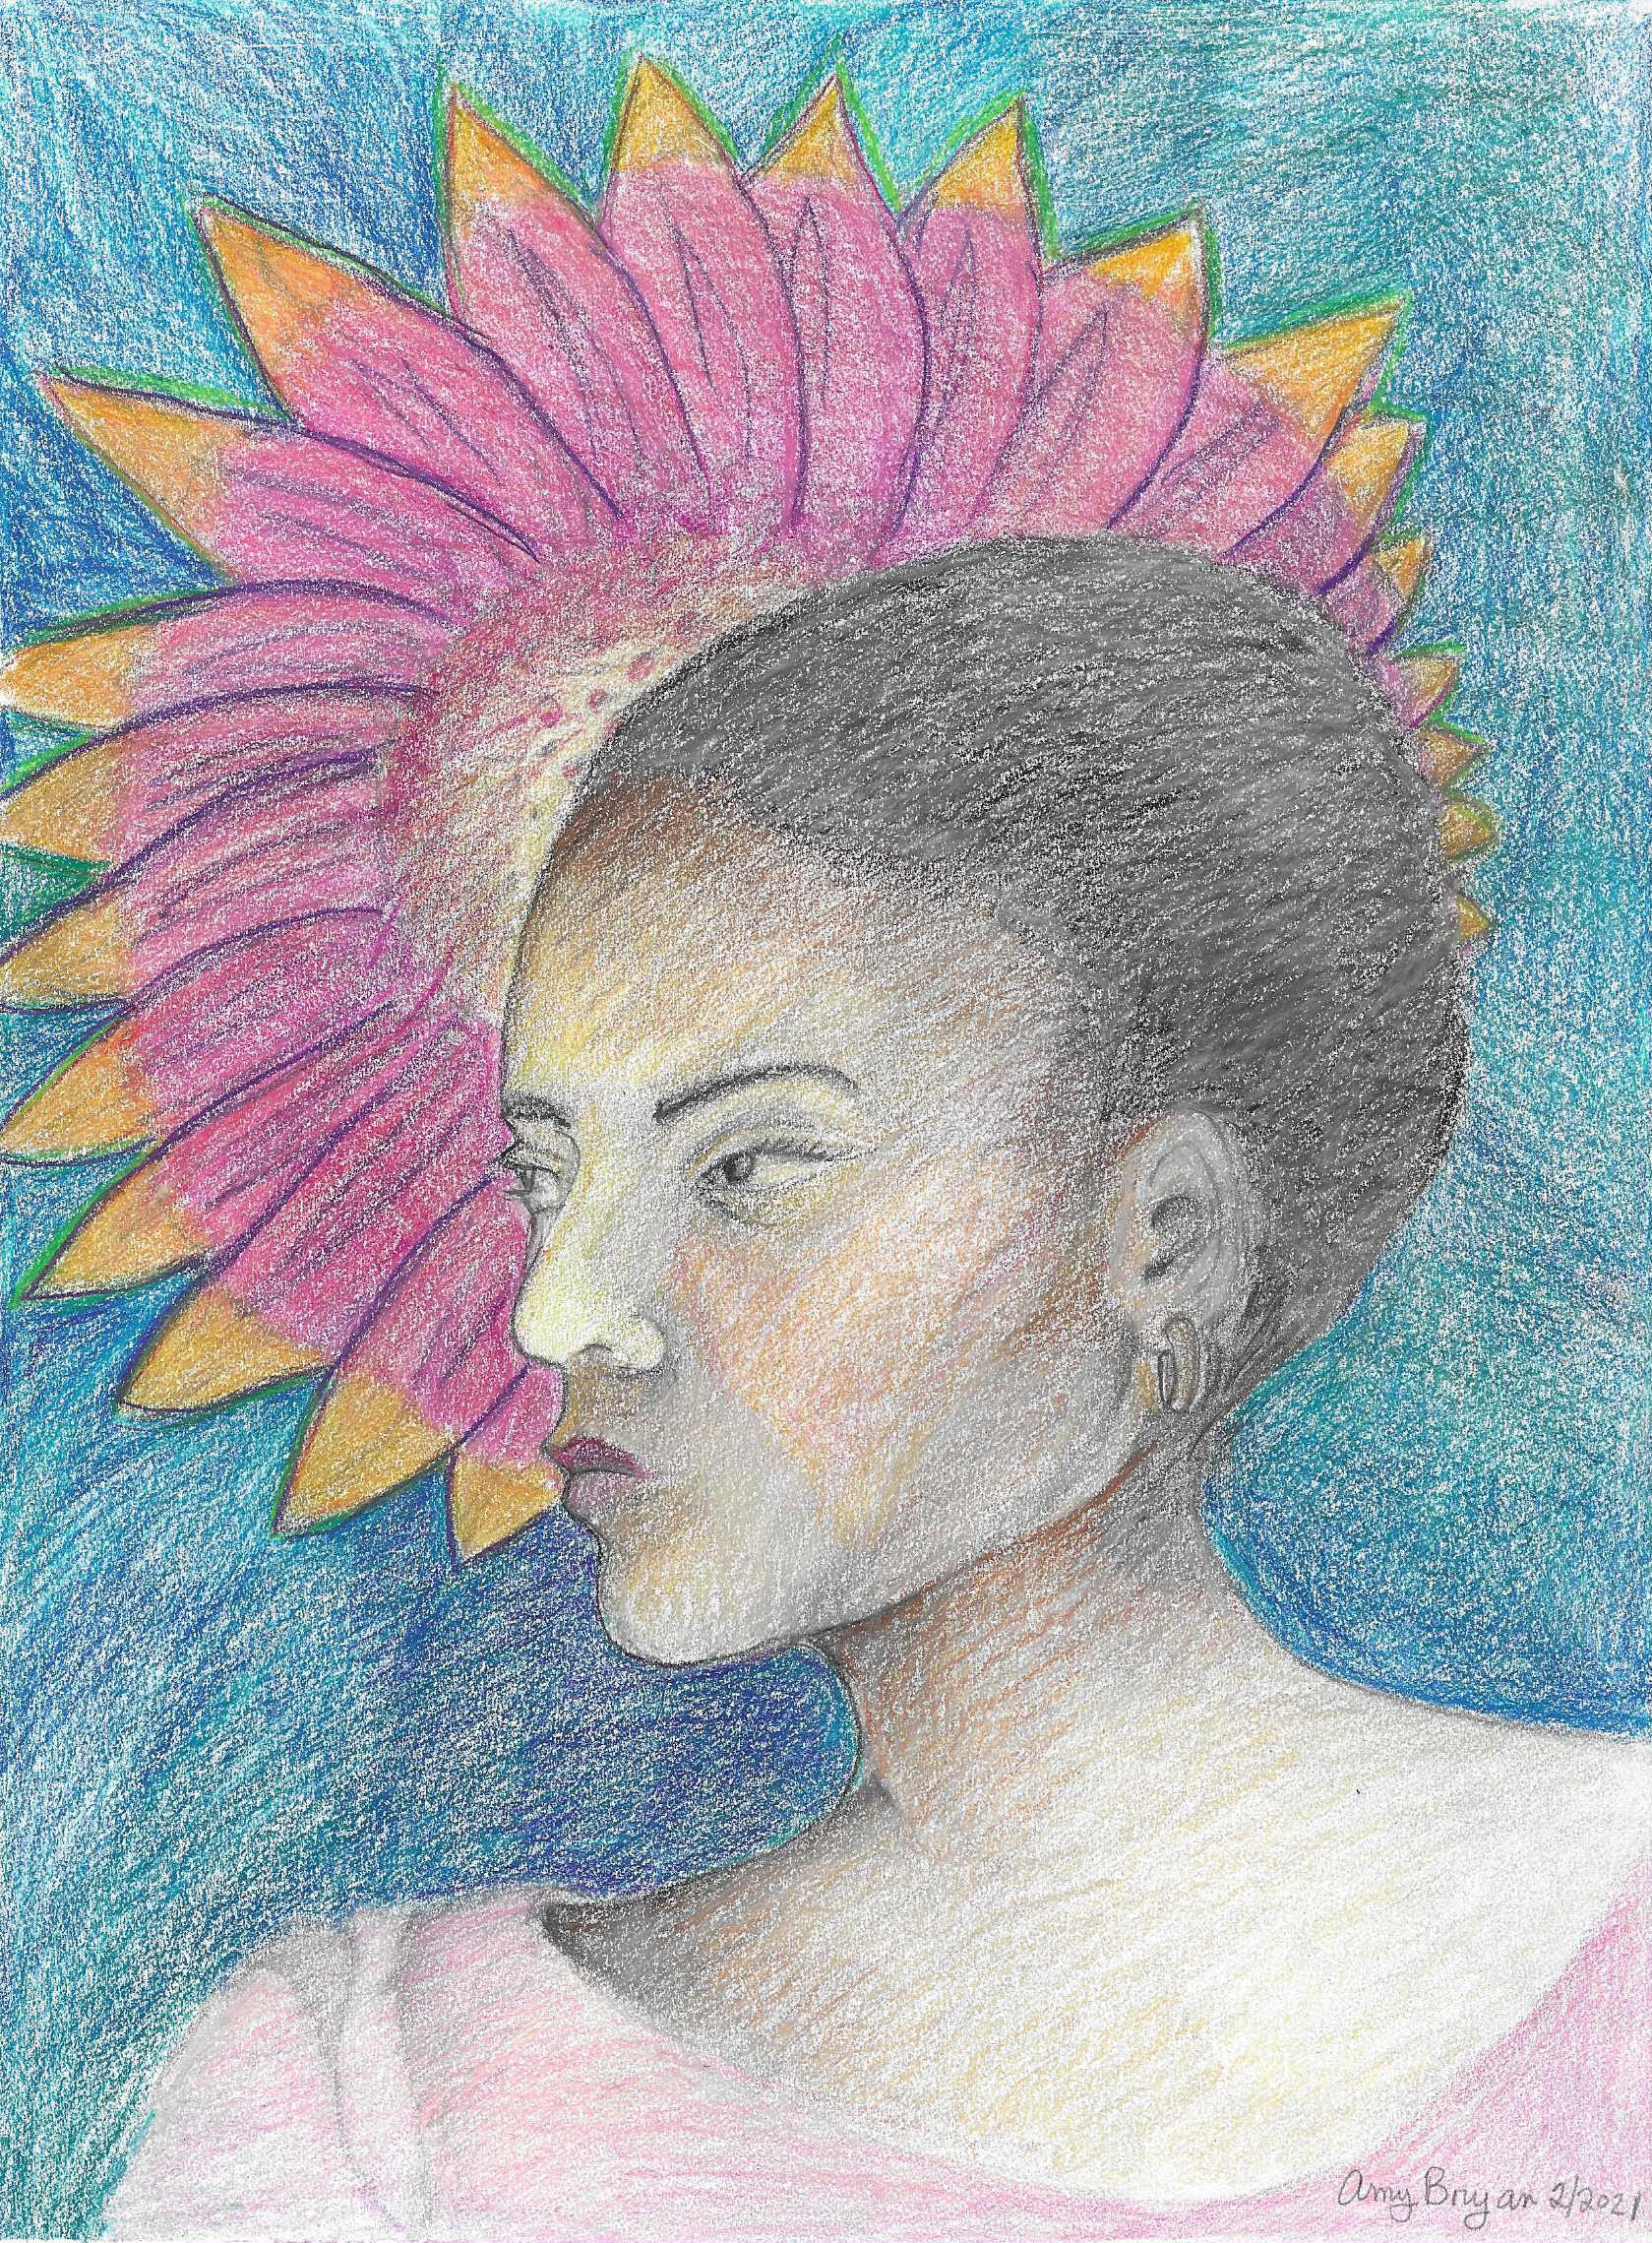 Abryanportrait with pink flower9x12coloredpencil2021 200 avwgun